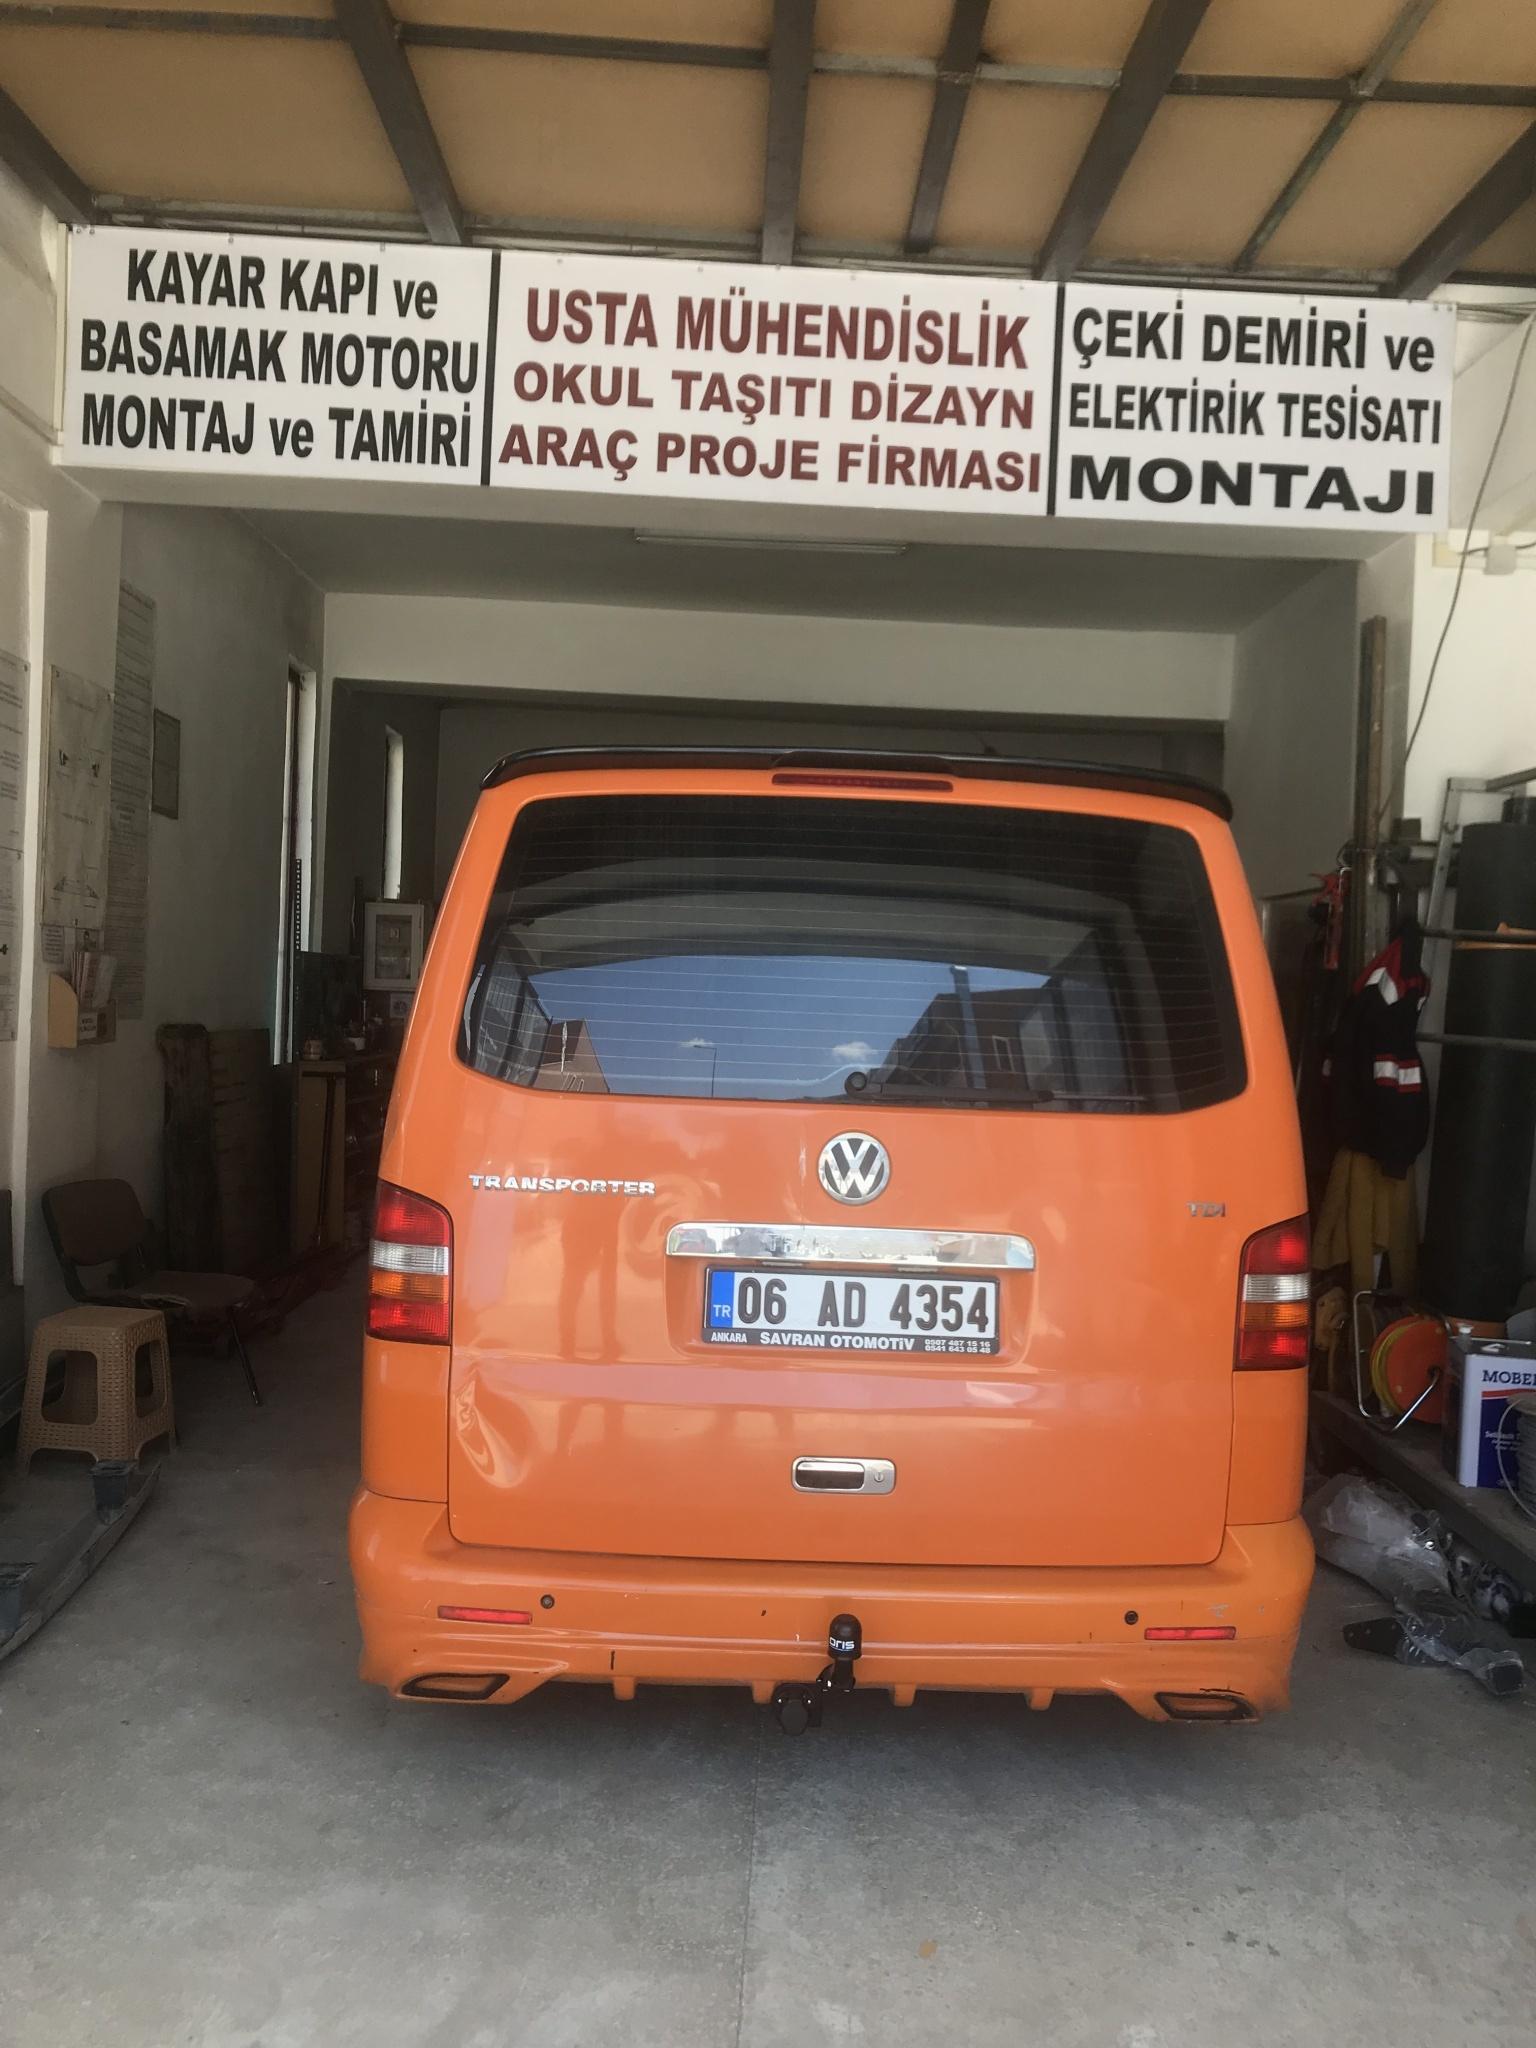 VOLSWAGEN TRANSPORTER /Çeki demiri MONTAJI+ARAÇ PROJE Ankara